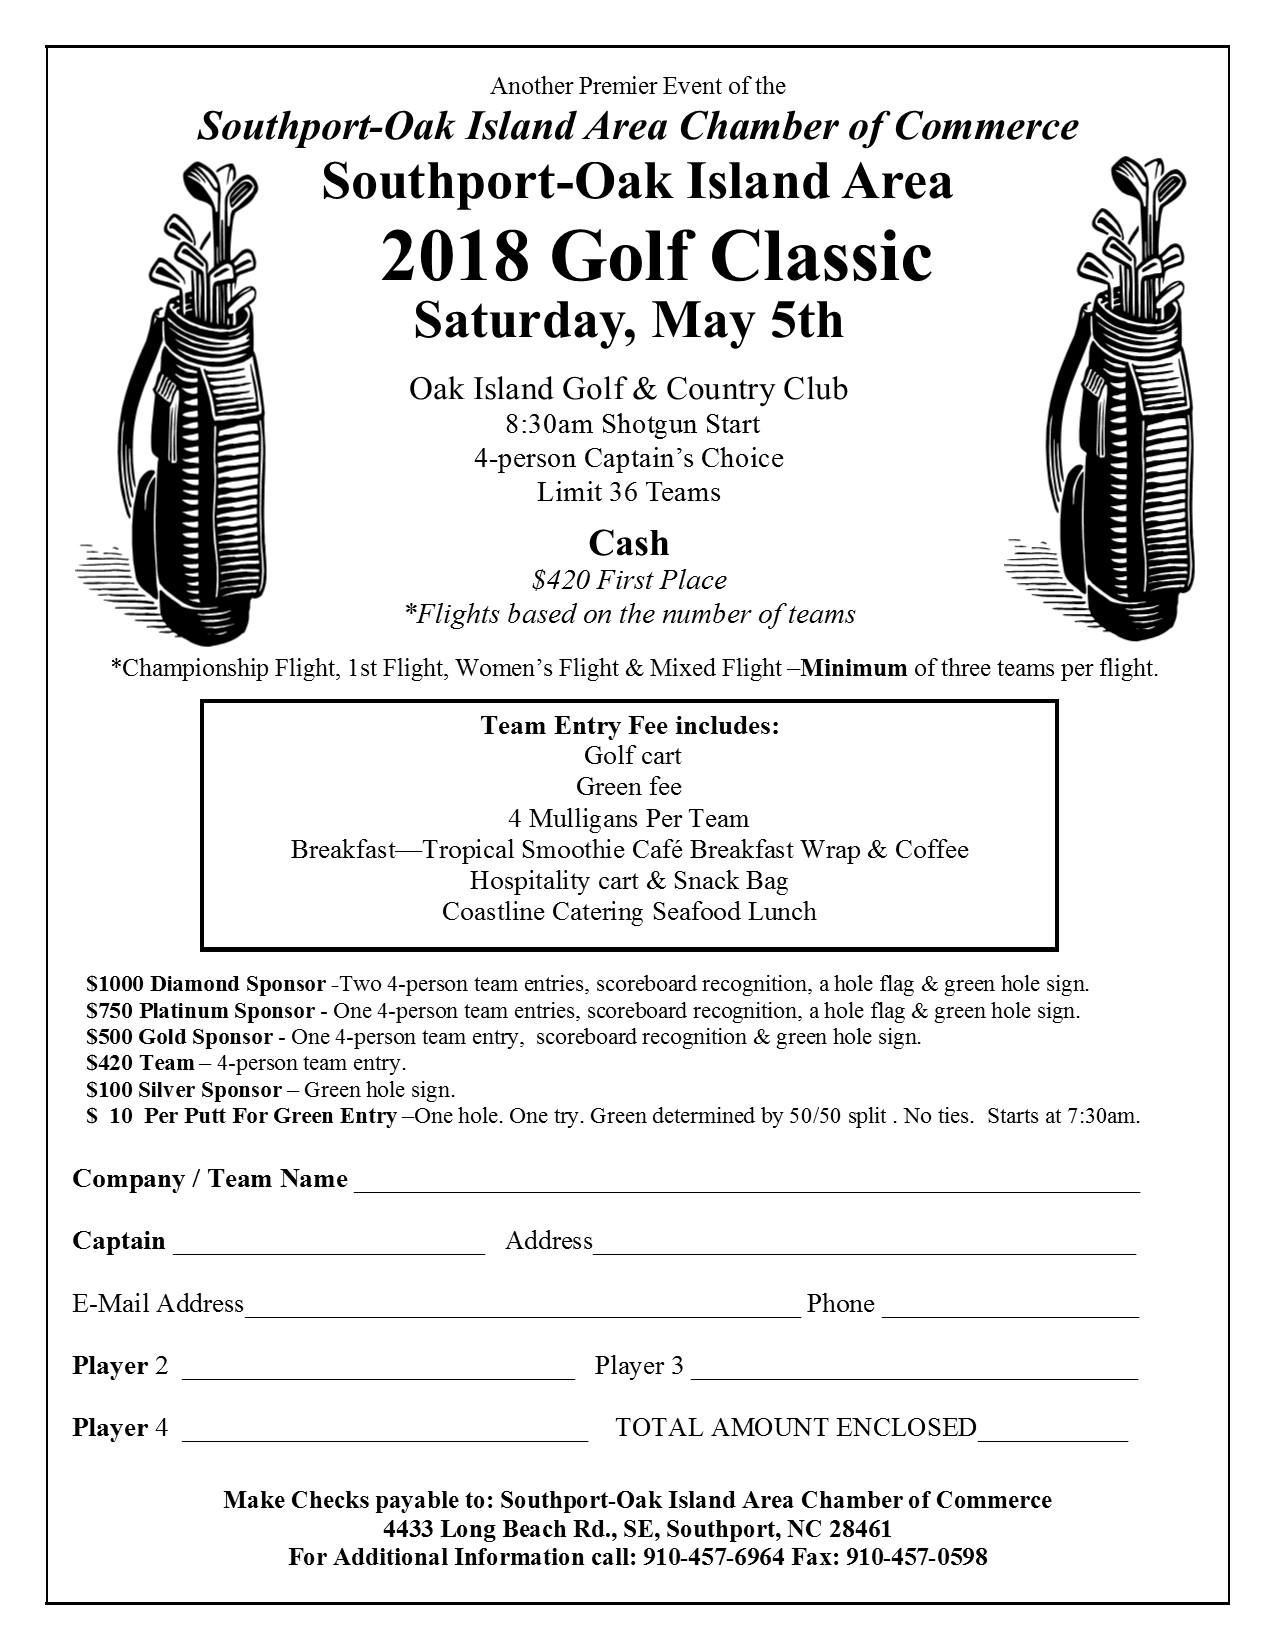 Southport-Oak Island Golf Classic